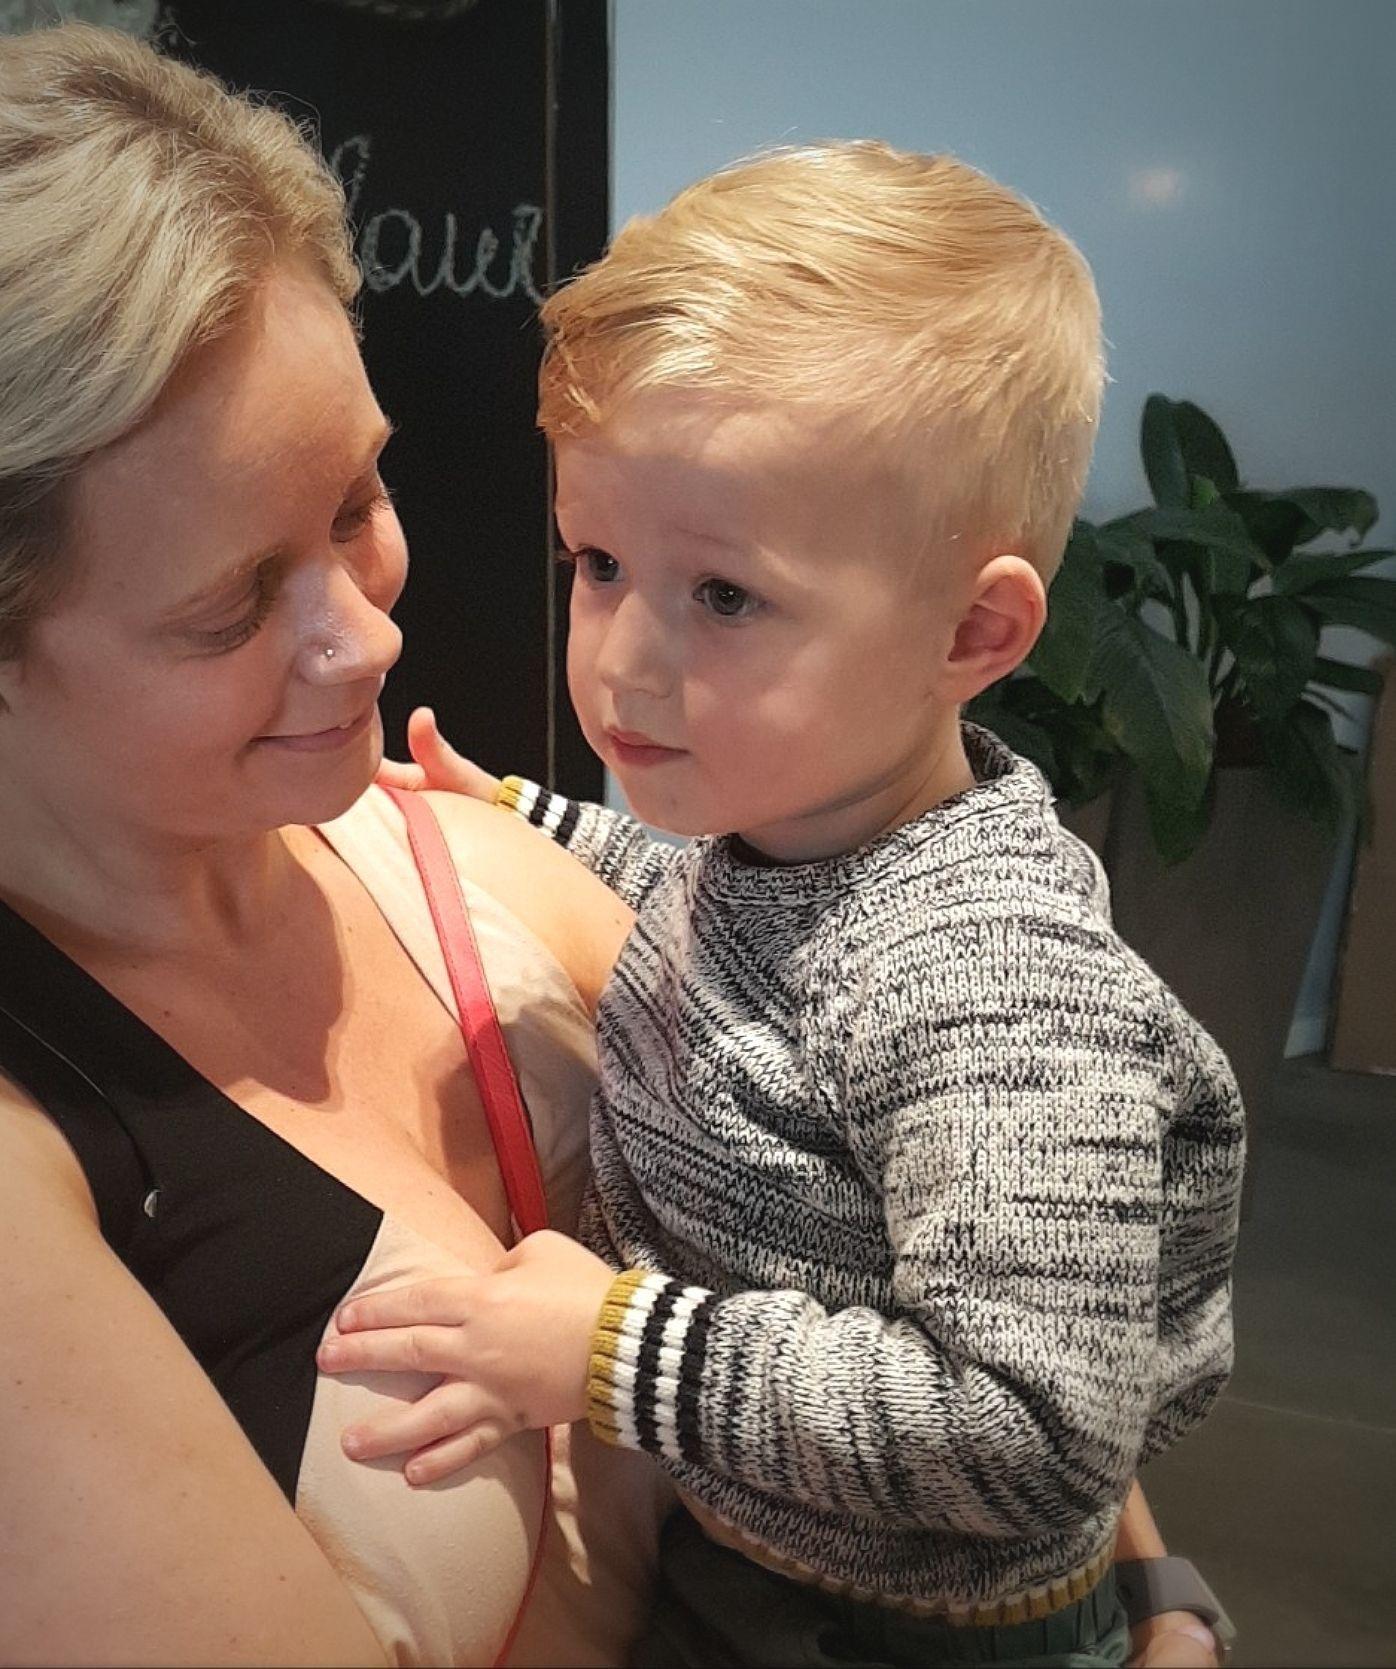 trendy boy's haircut baby boys haircut 2018 blonde blue eyes stylish